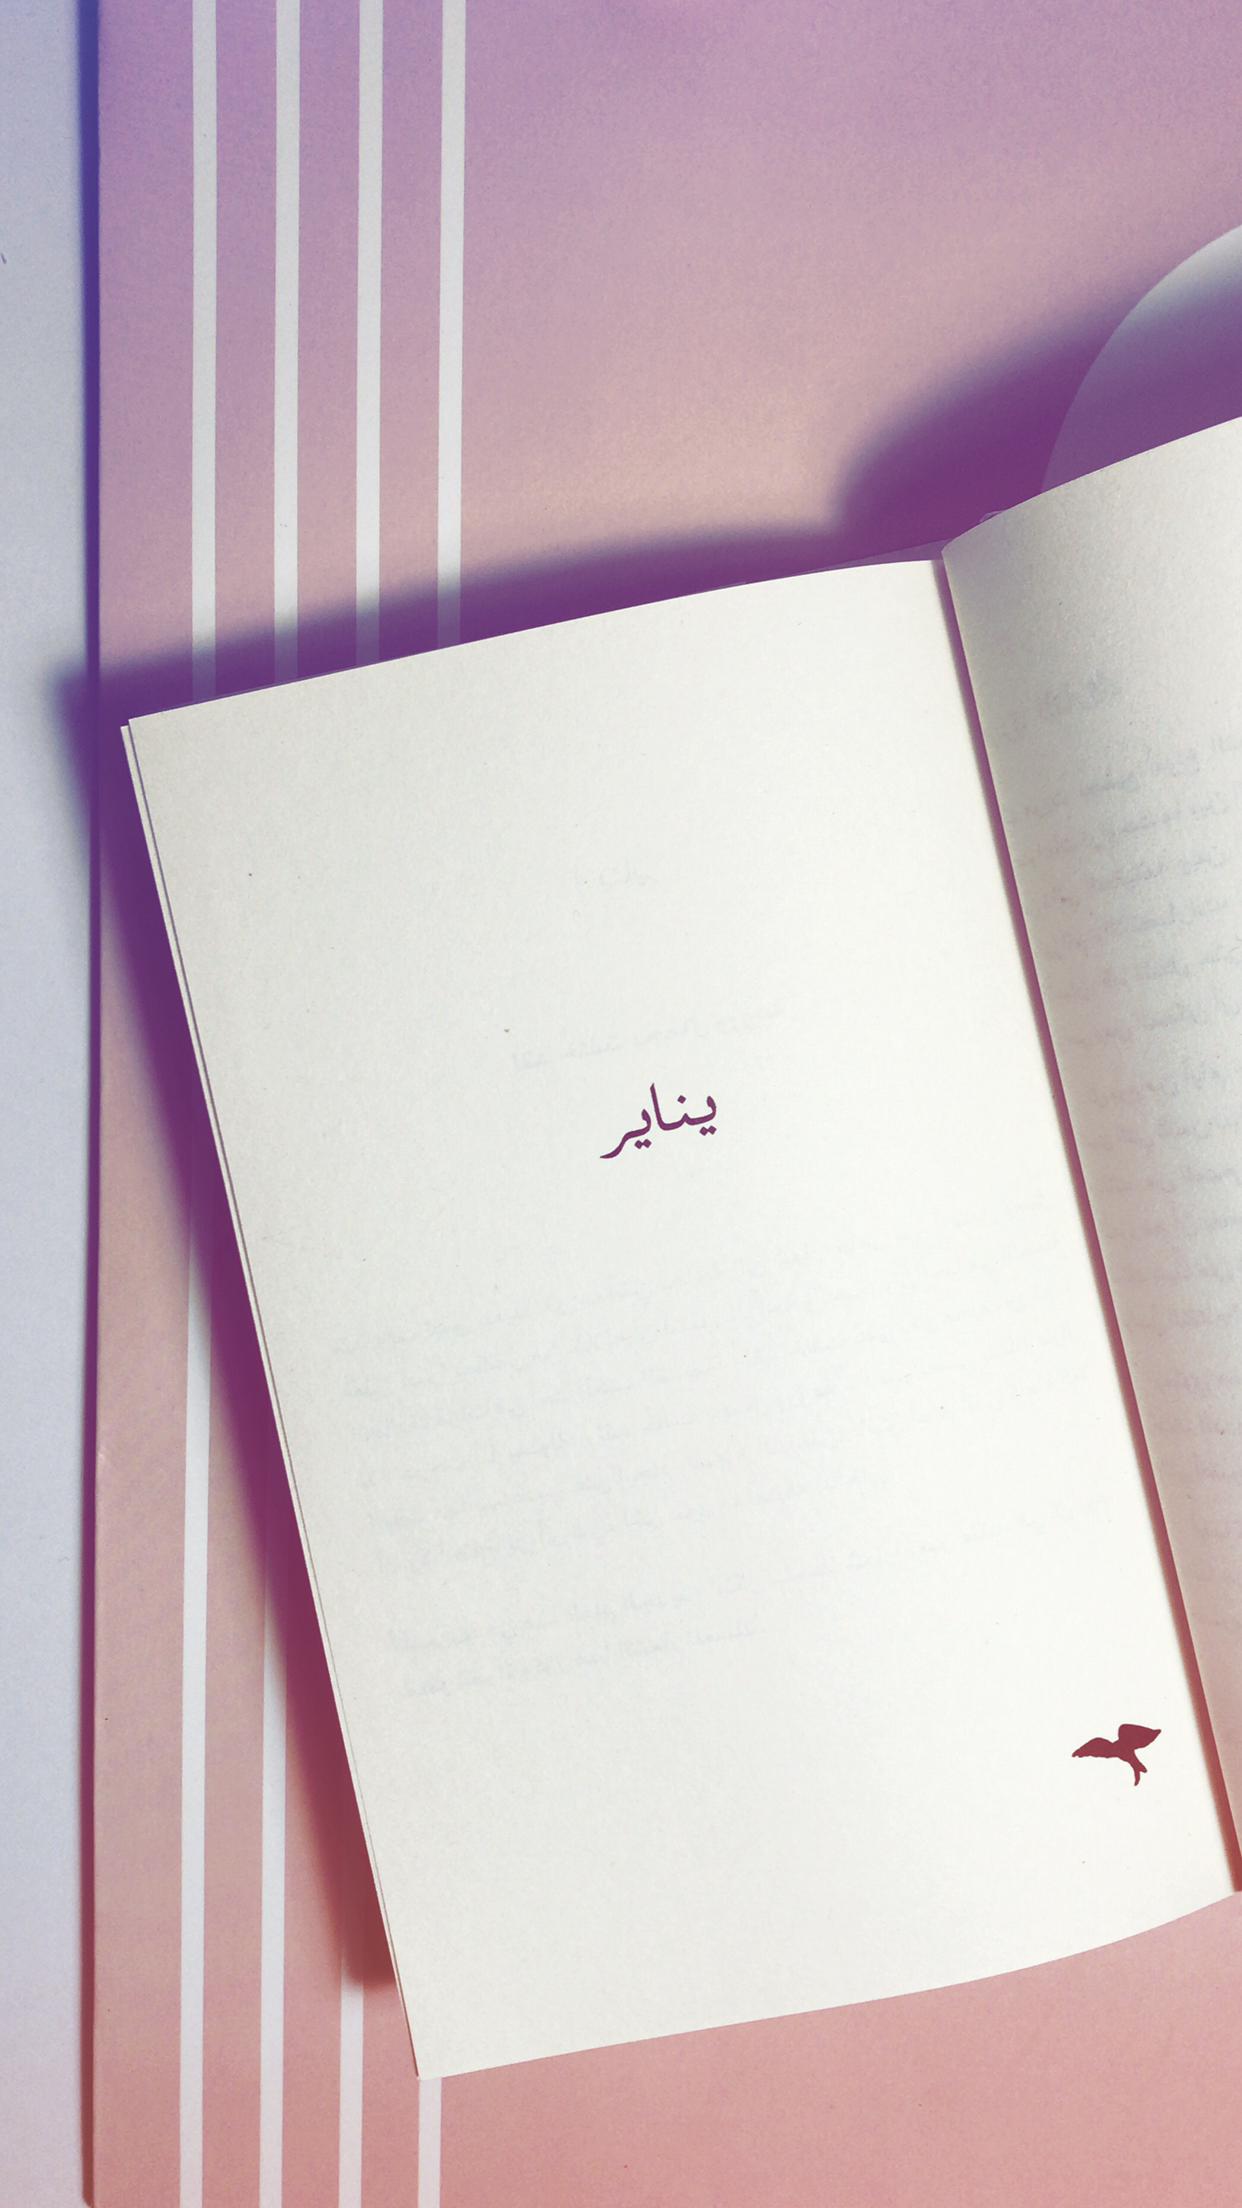 January مواليد يناير شهر يناير تصويري كتاب ابق قوي ا لـ ديمي لوڤاتو Beautiful Arabic Words Talking Quotes Branding Design Logo